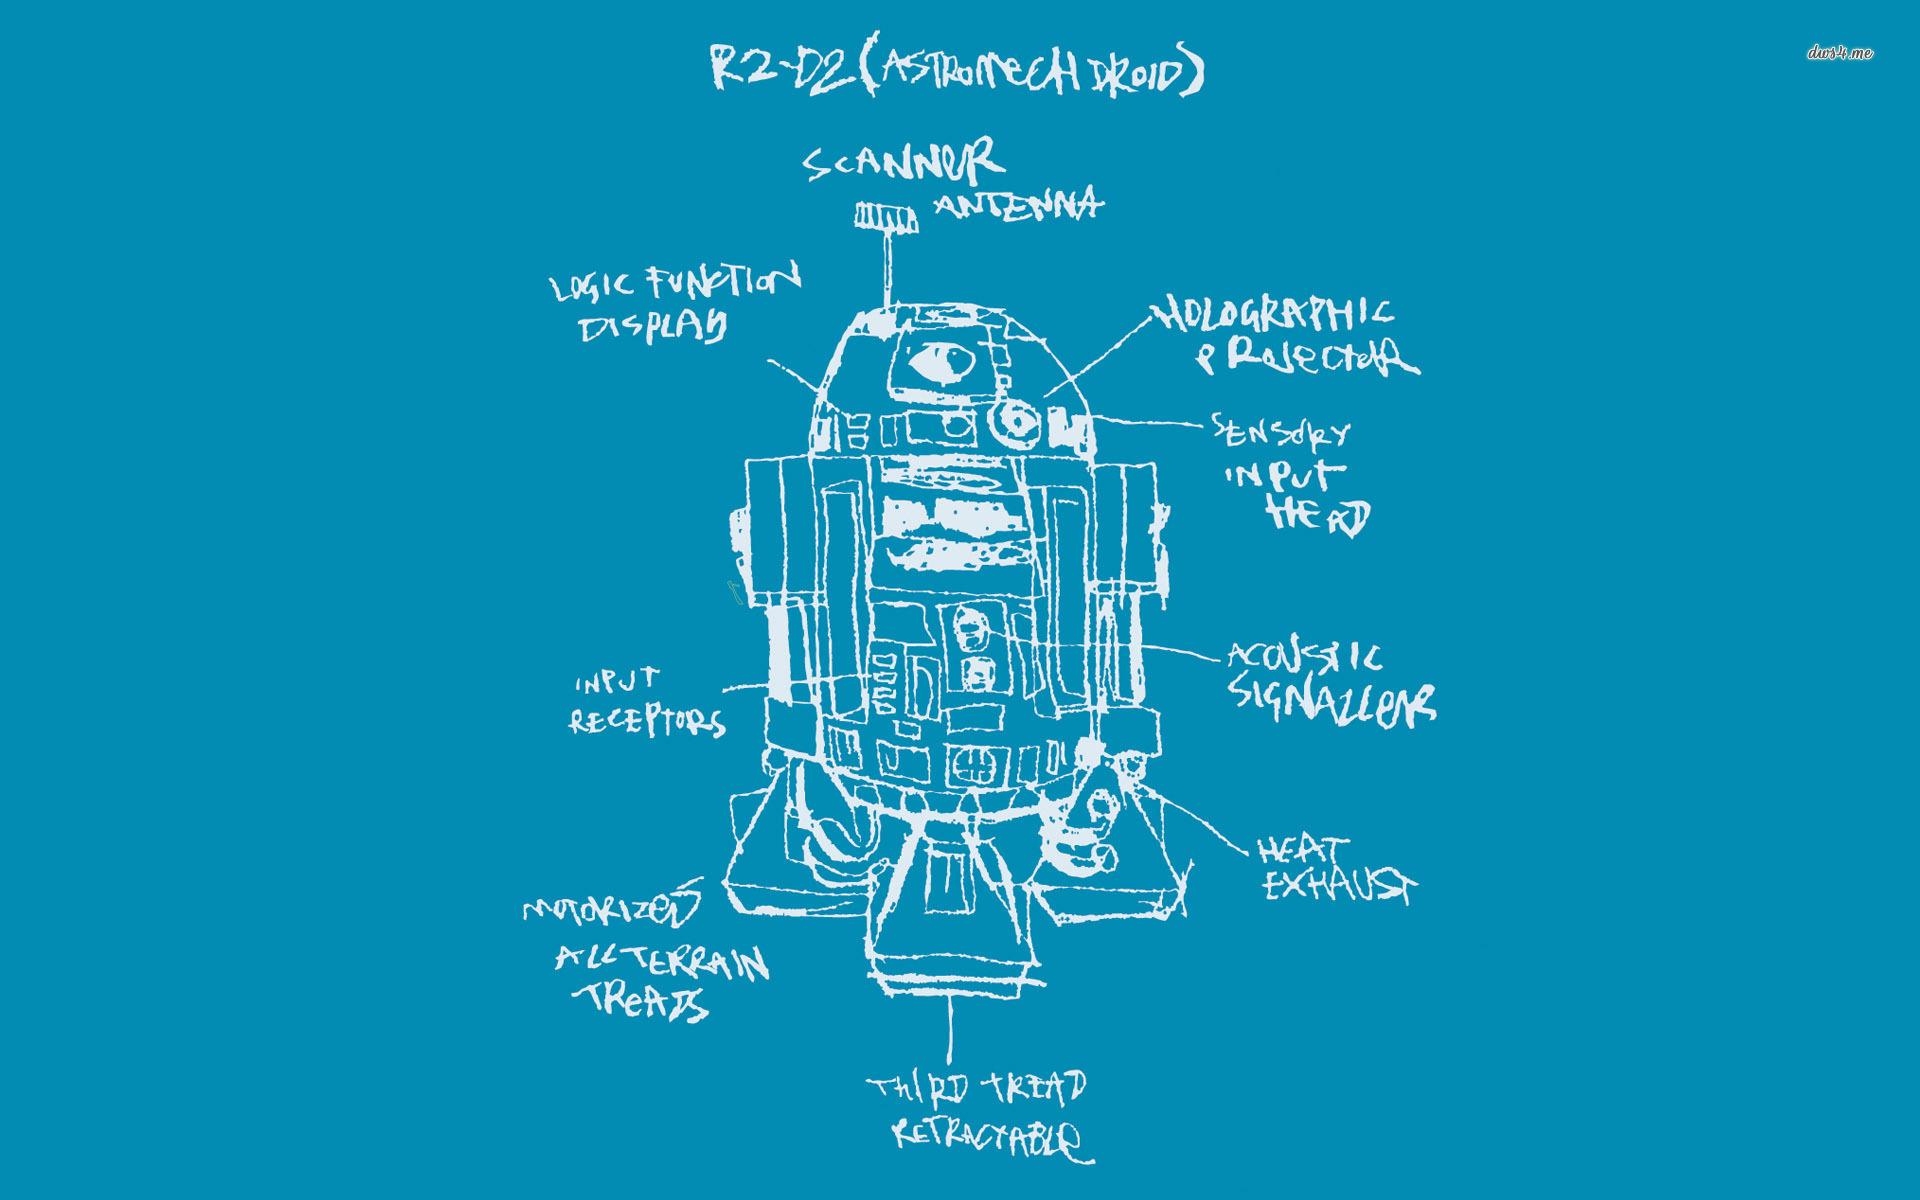 Best 50 R2 D2 iPhone Background on HipWallpaper R2 D2